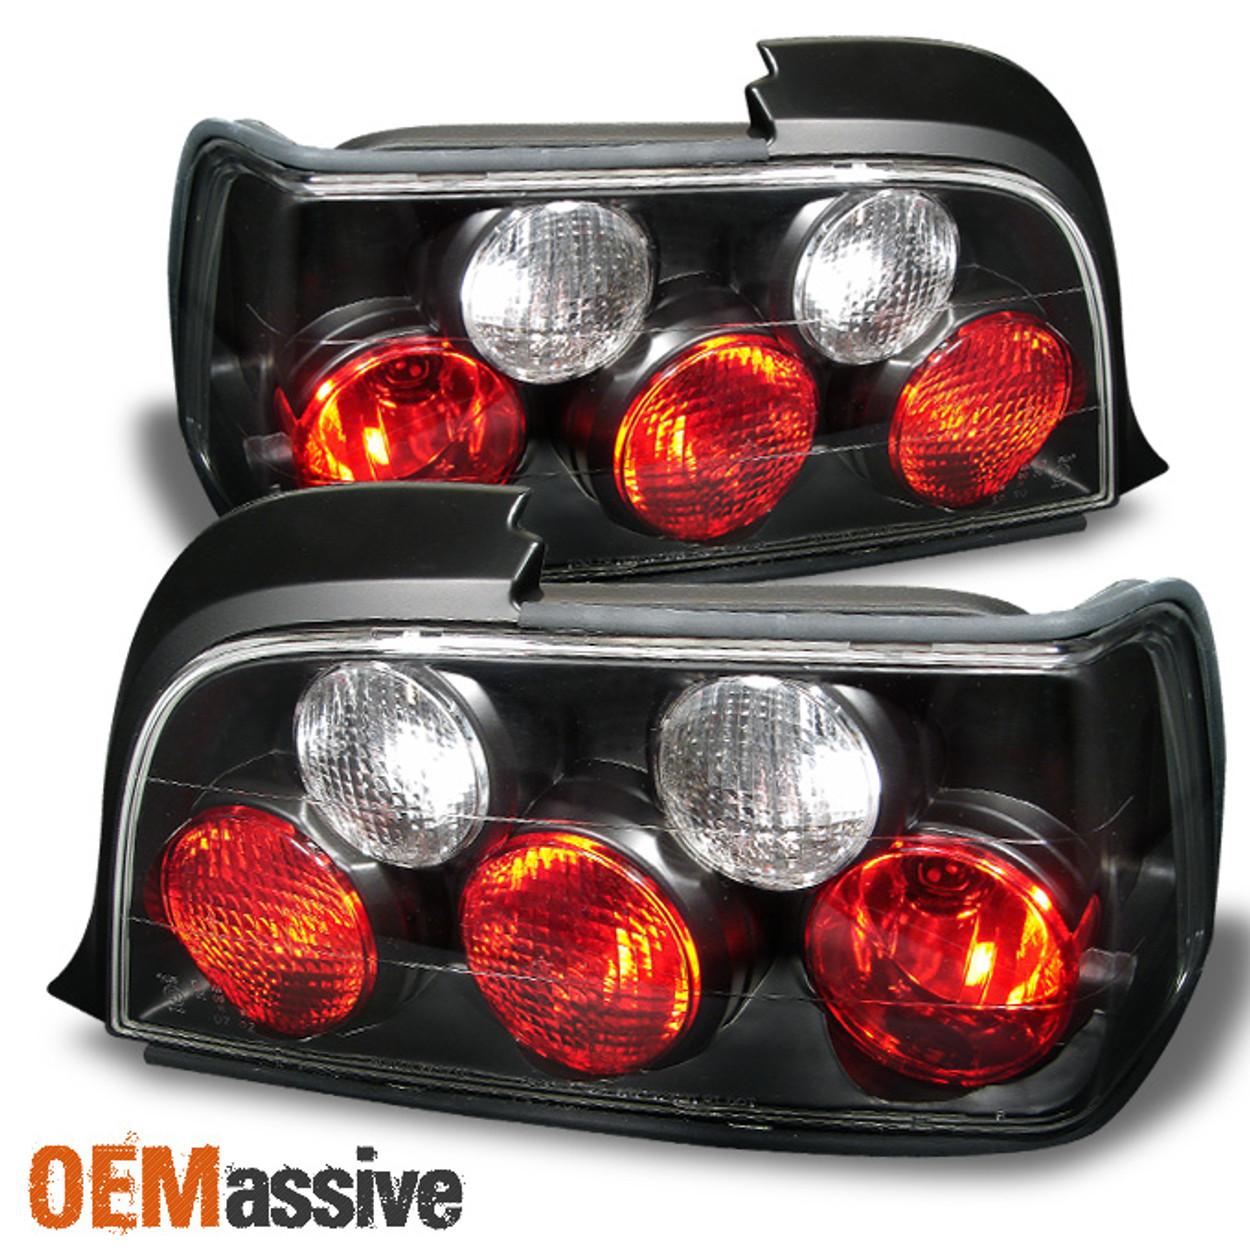 Fits 92 98 Bmw E36 3 Series 2dr Coupe Jdm Black Tail Brake Light Lamp Left Right Oemassive